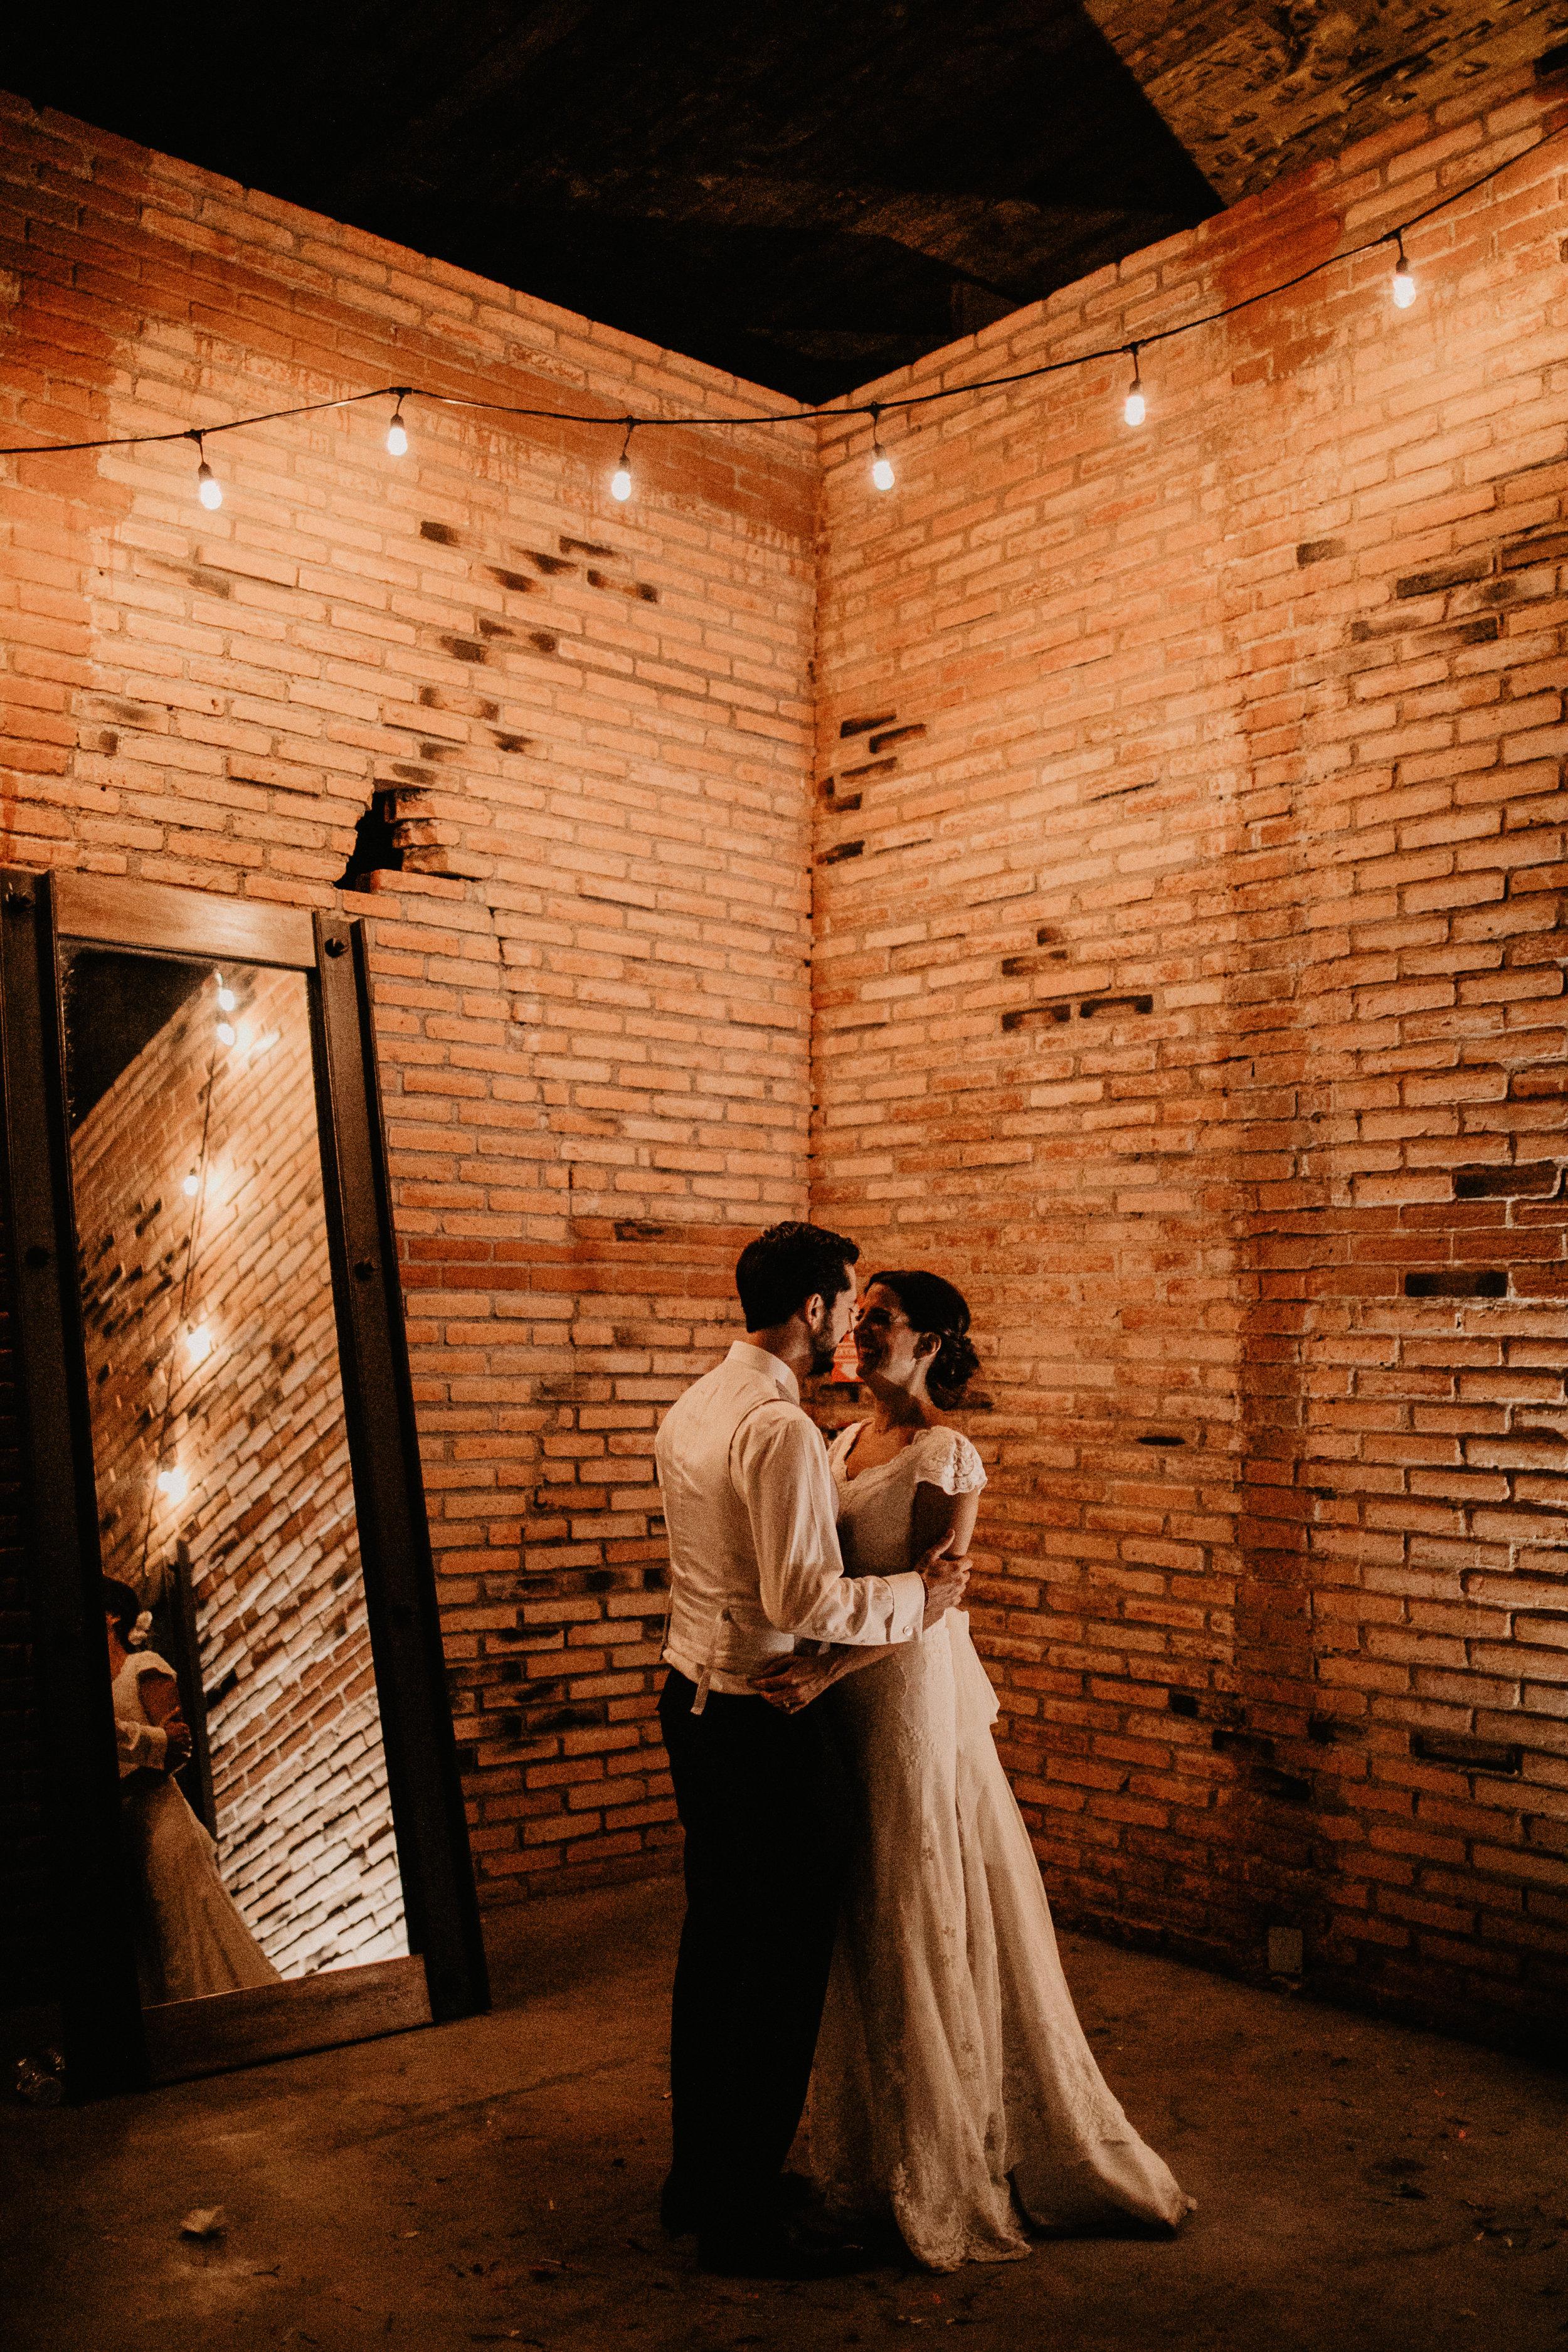 alfonso_flores_destination_wedding_photographer_pau_alonso_1429.JPG